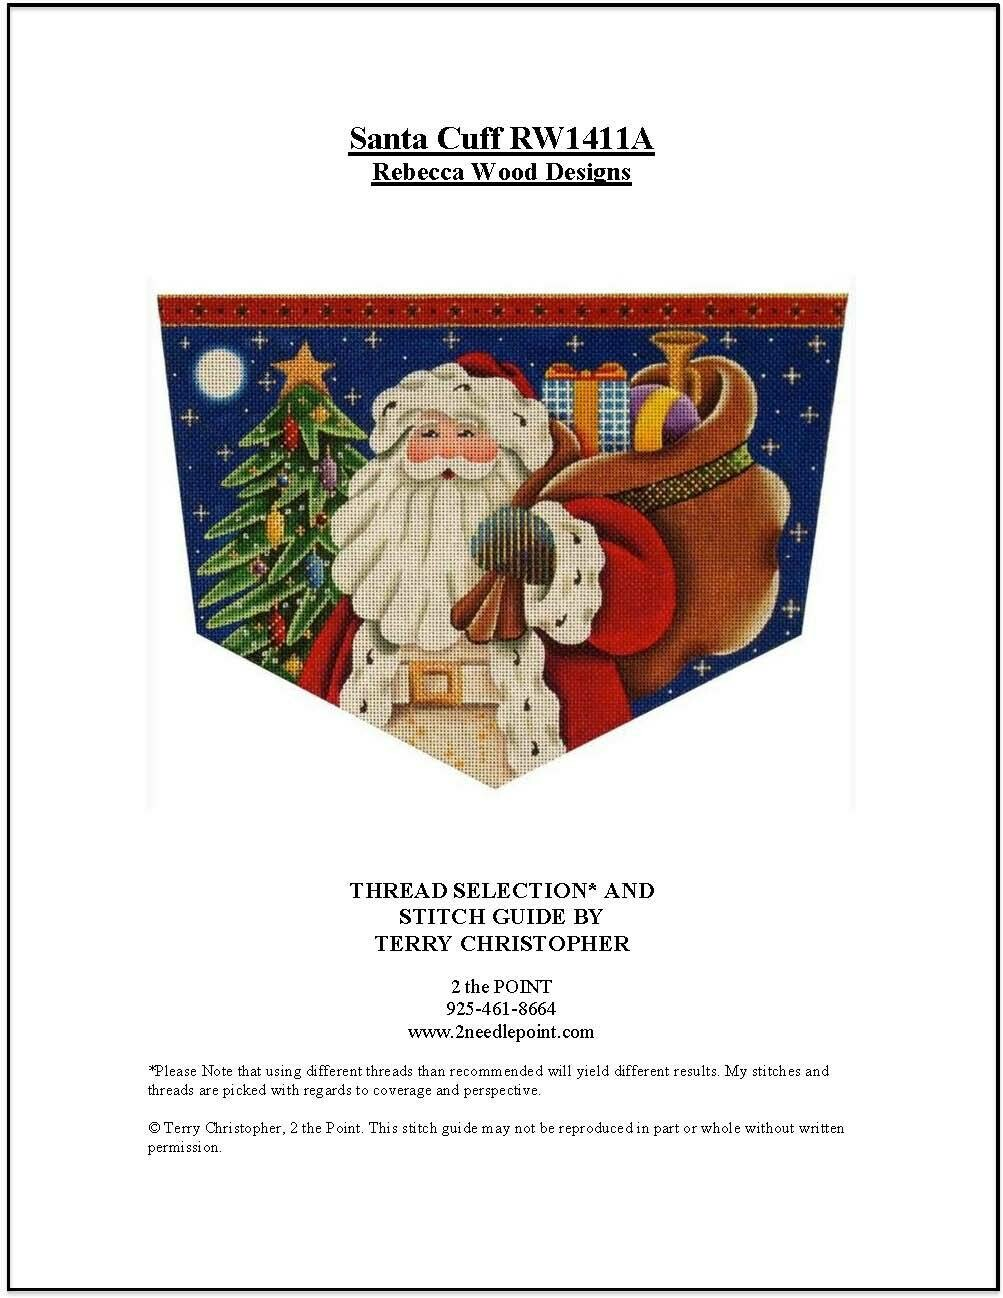 Rebecca Wood, Santa with Gifts Cuff RW1411A